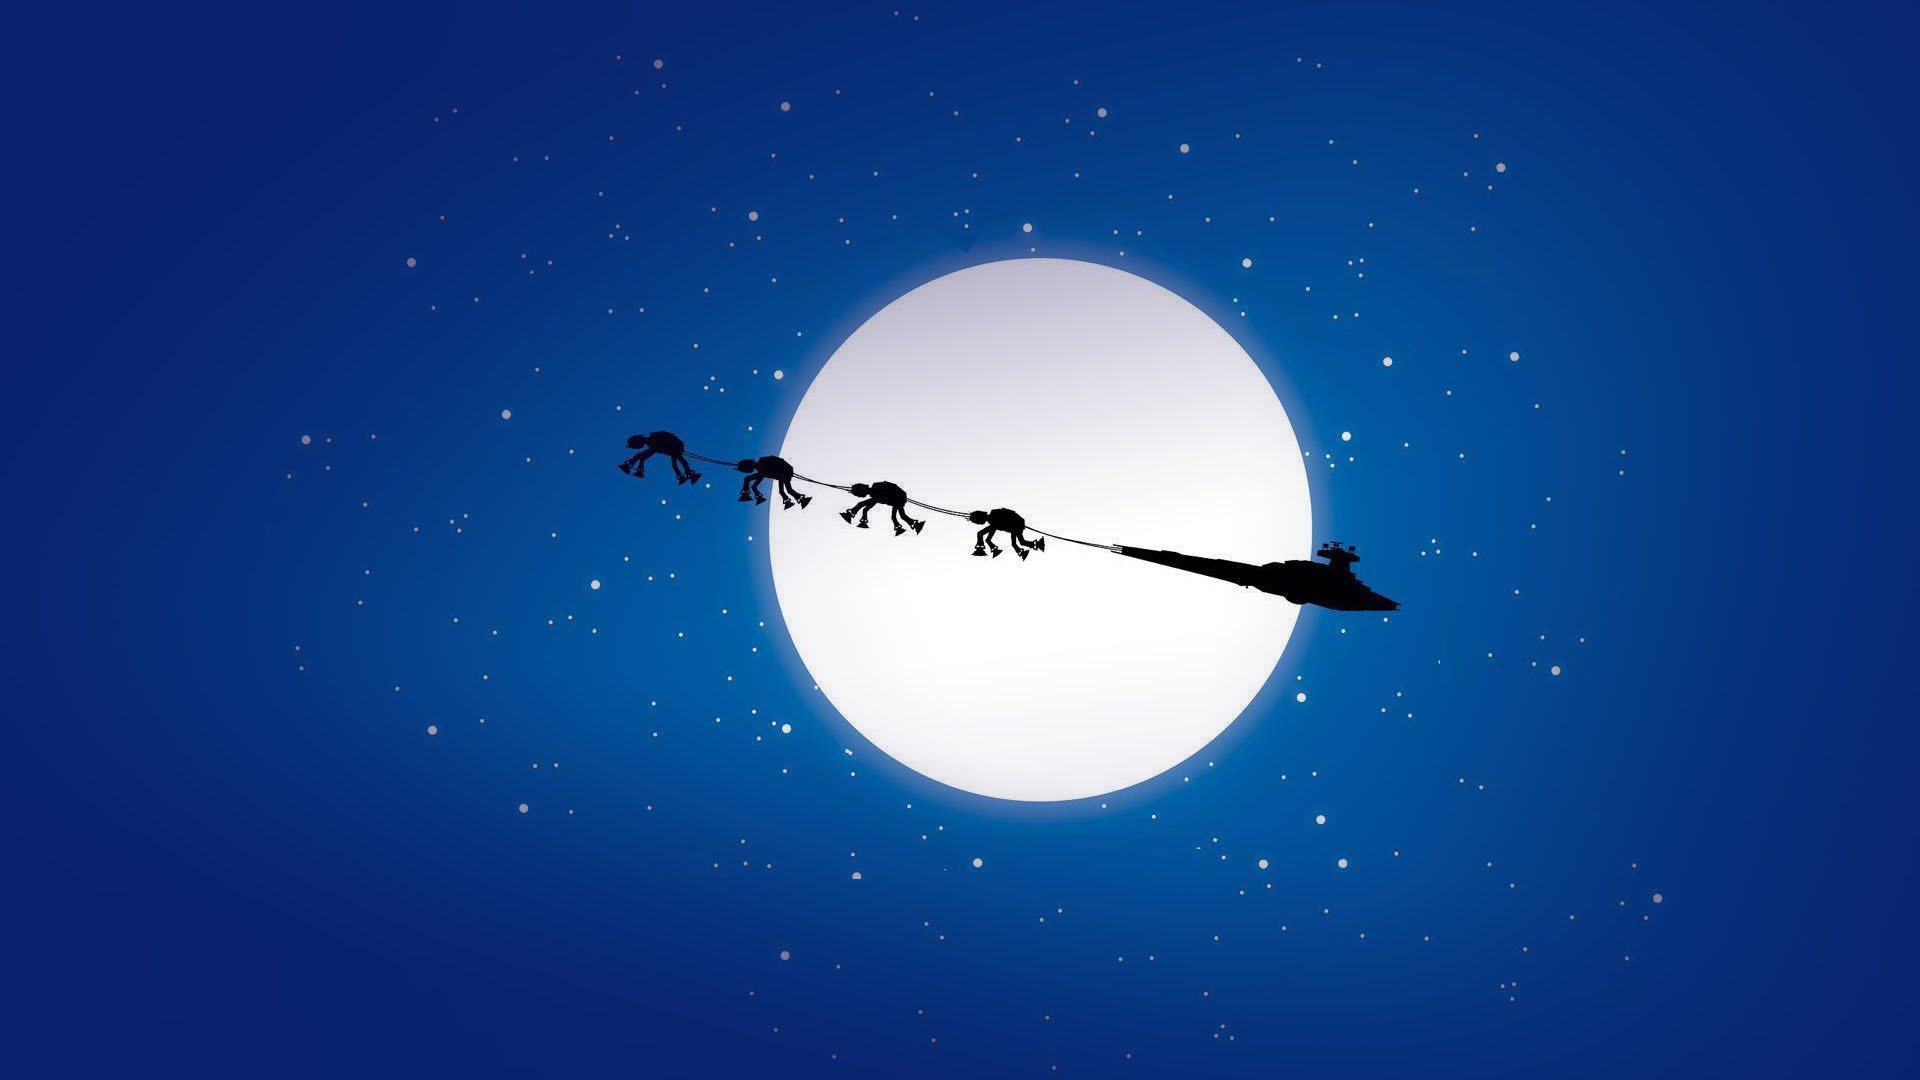 Star Wars Christmas Wallpaper